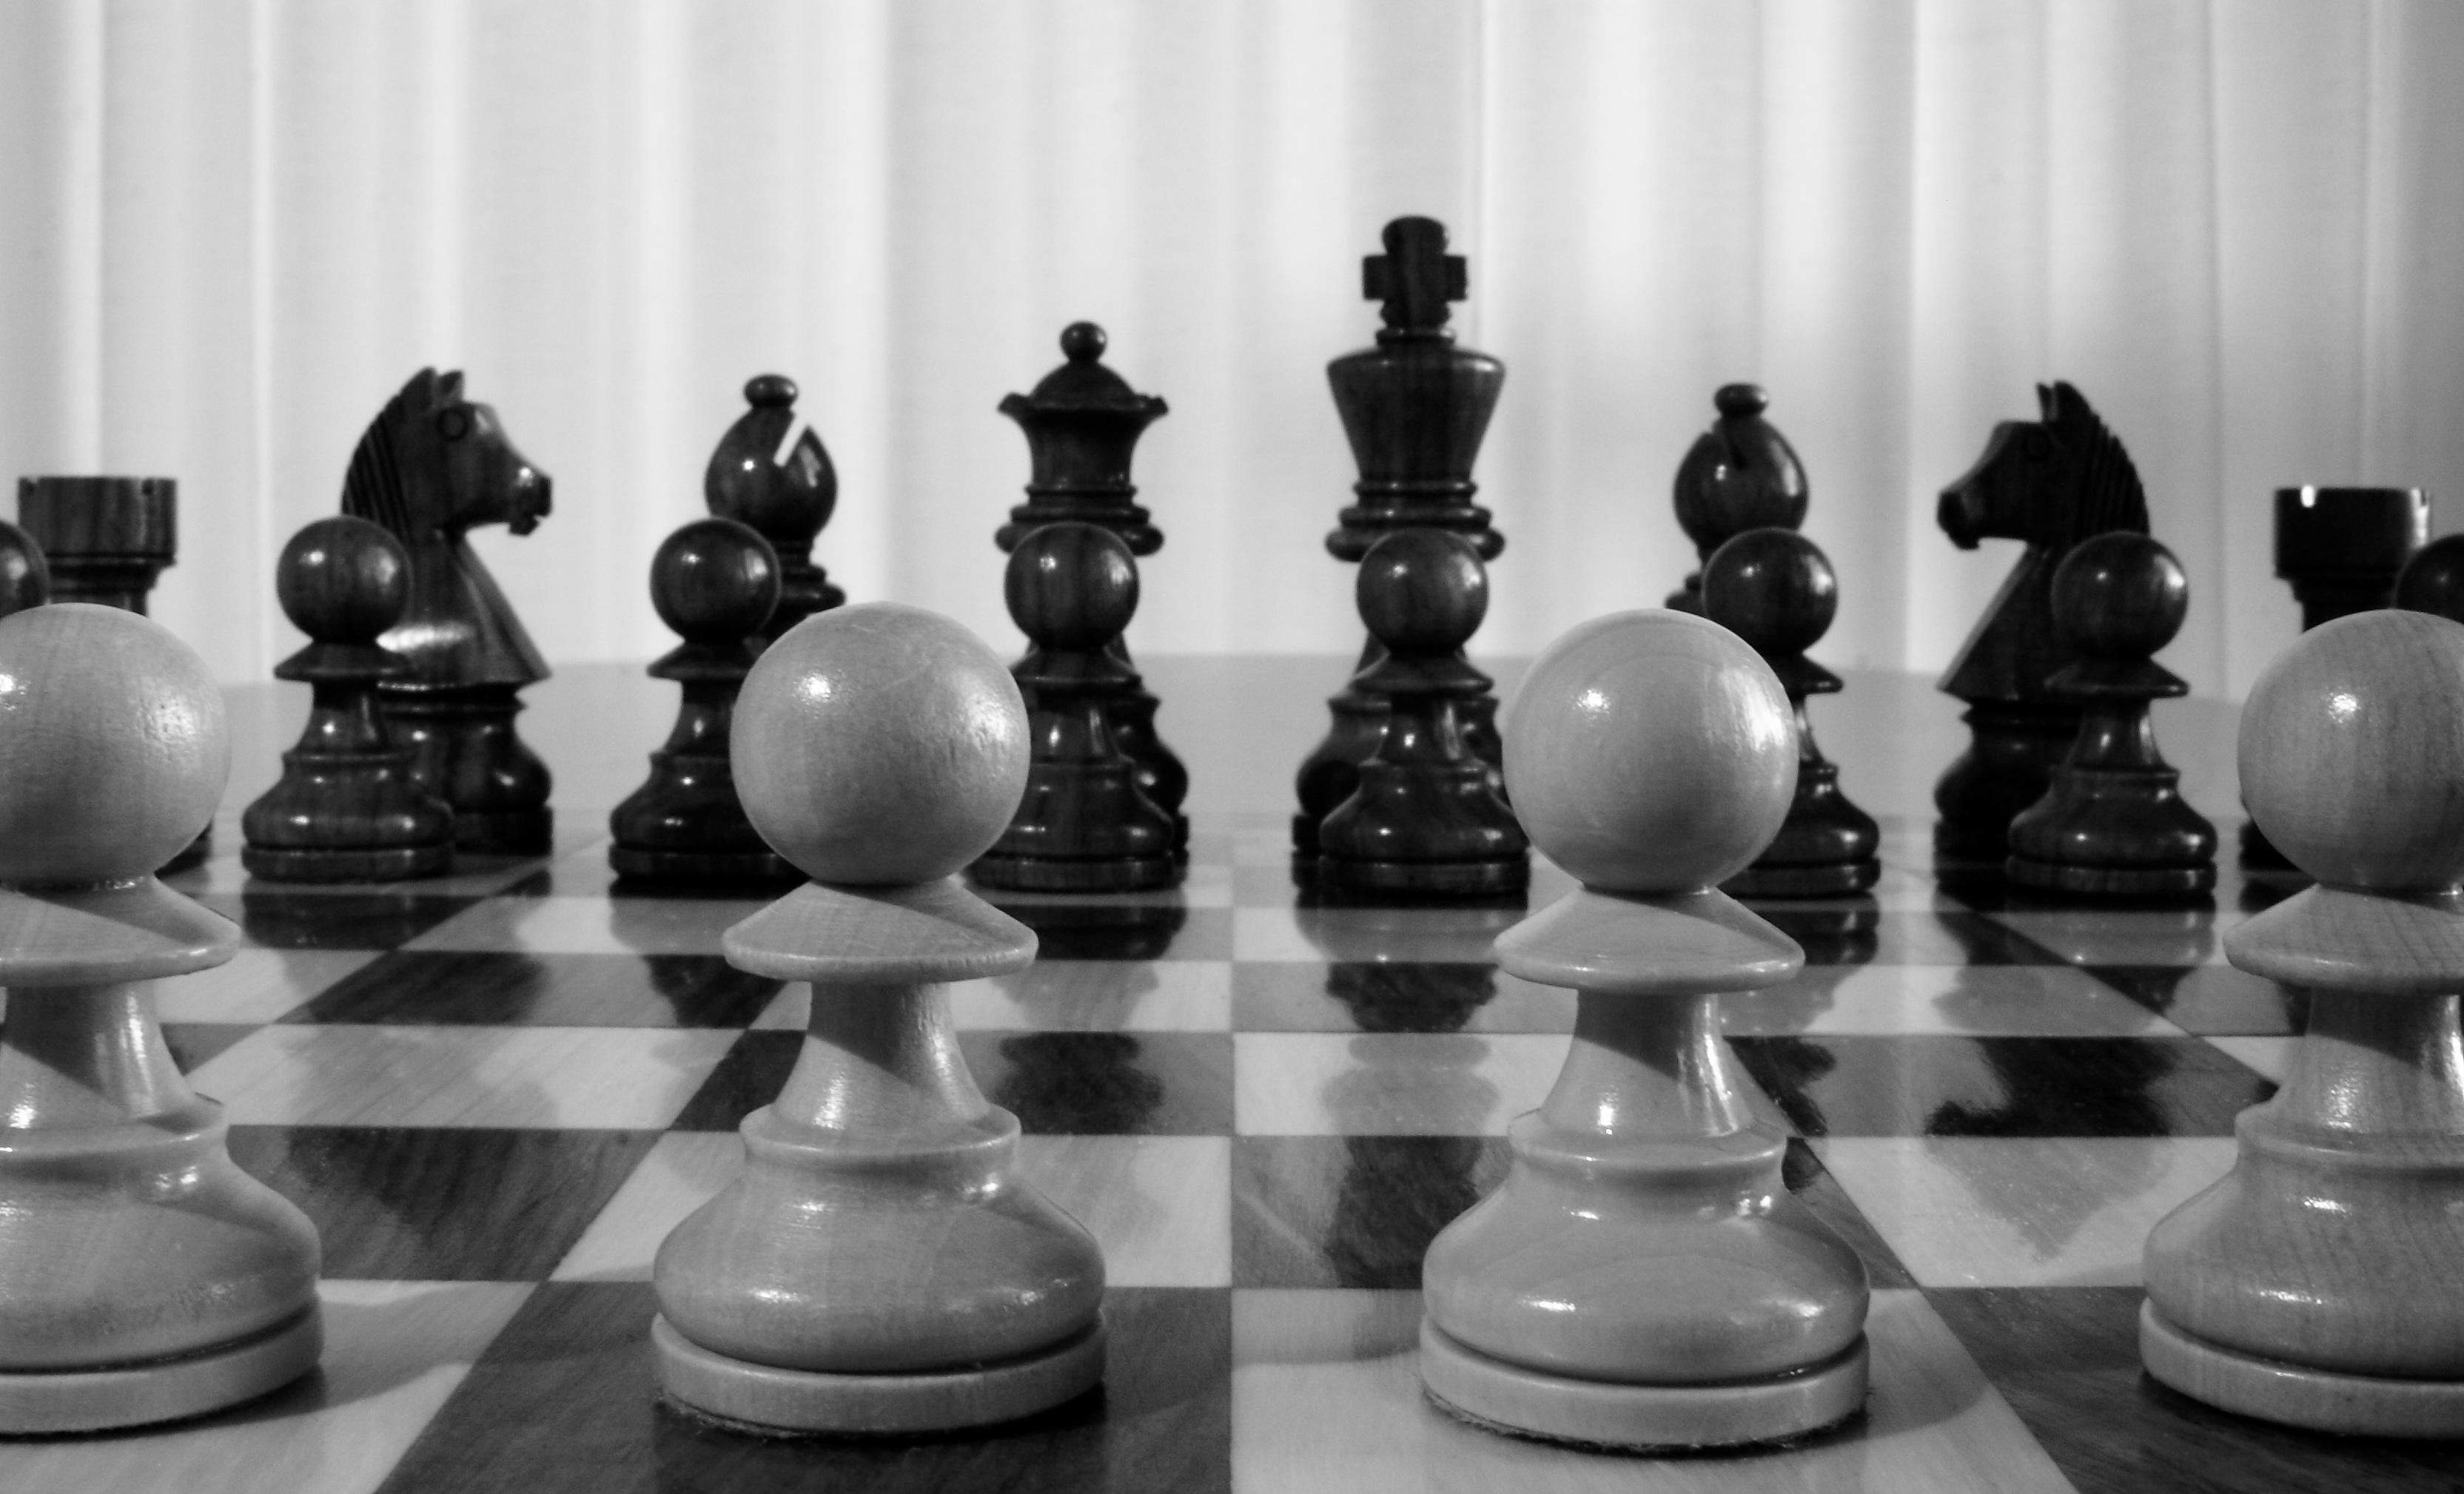 Black and white recreation black monochrome board game king sports symbolism chess chessboard match games monochrome